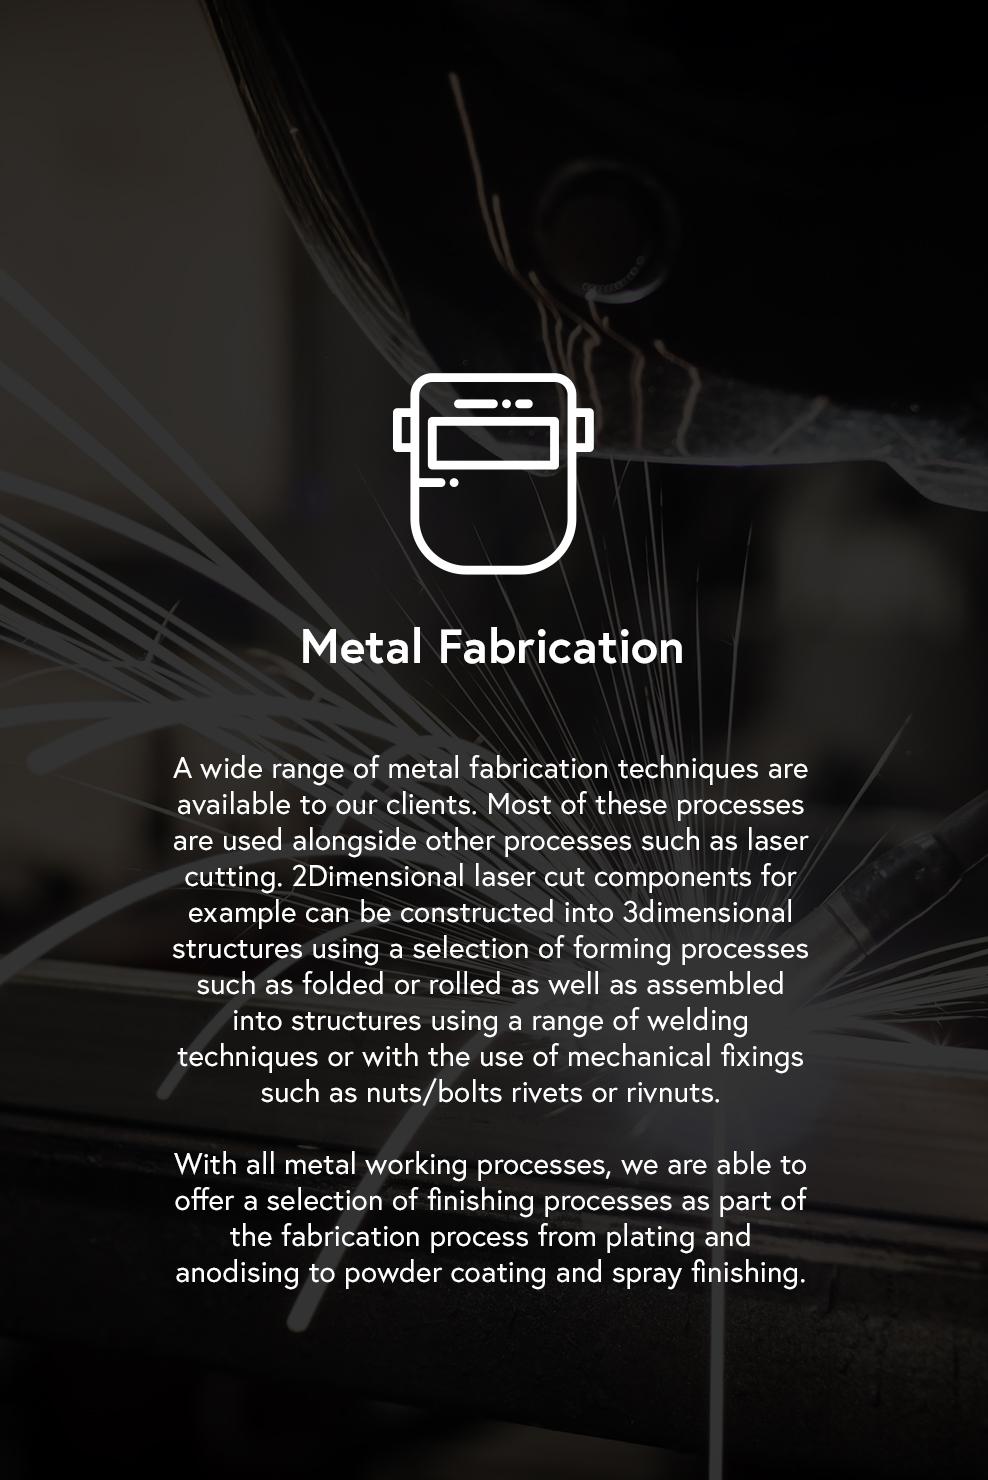 metal-fabrication.jpg